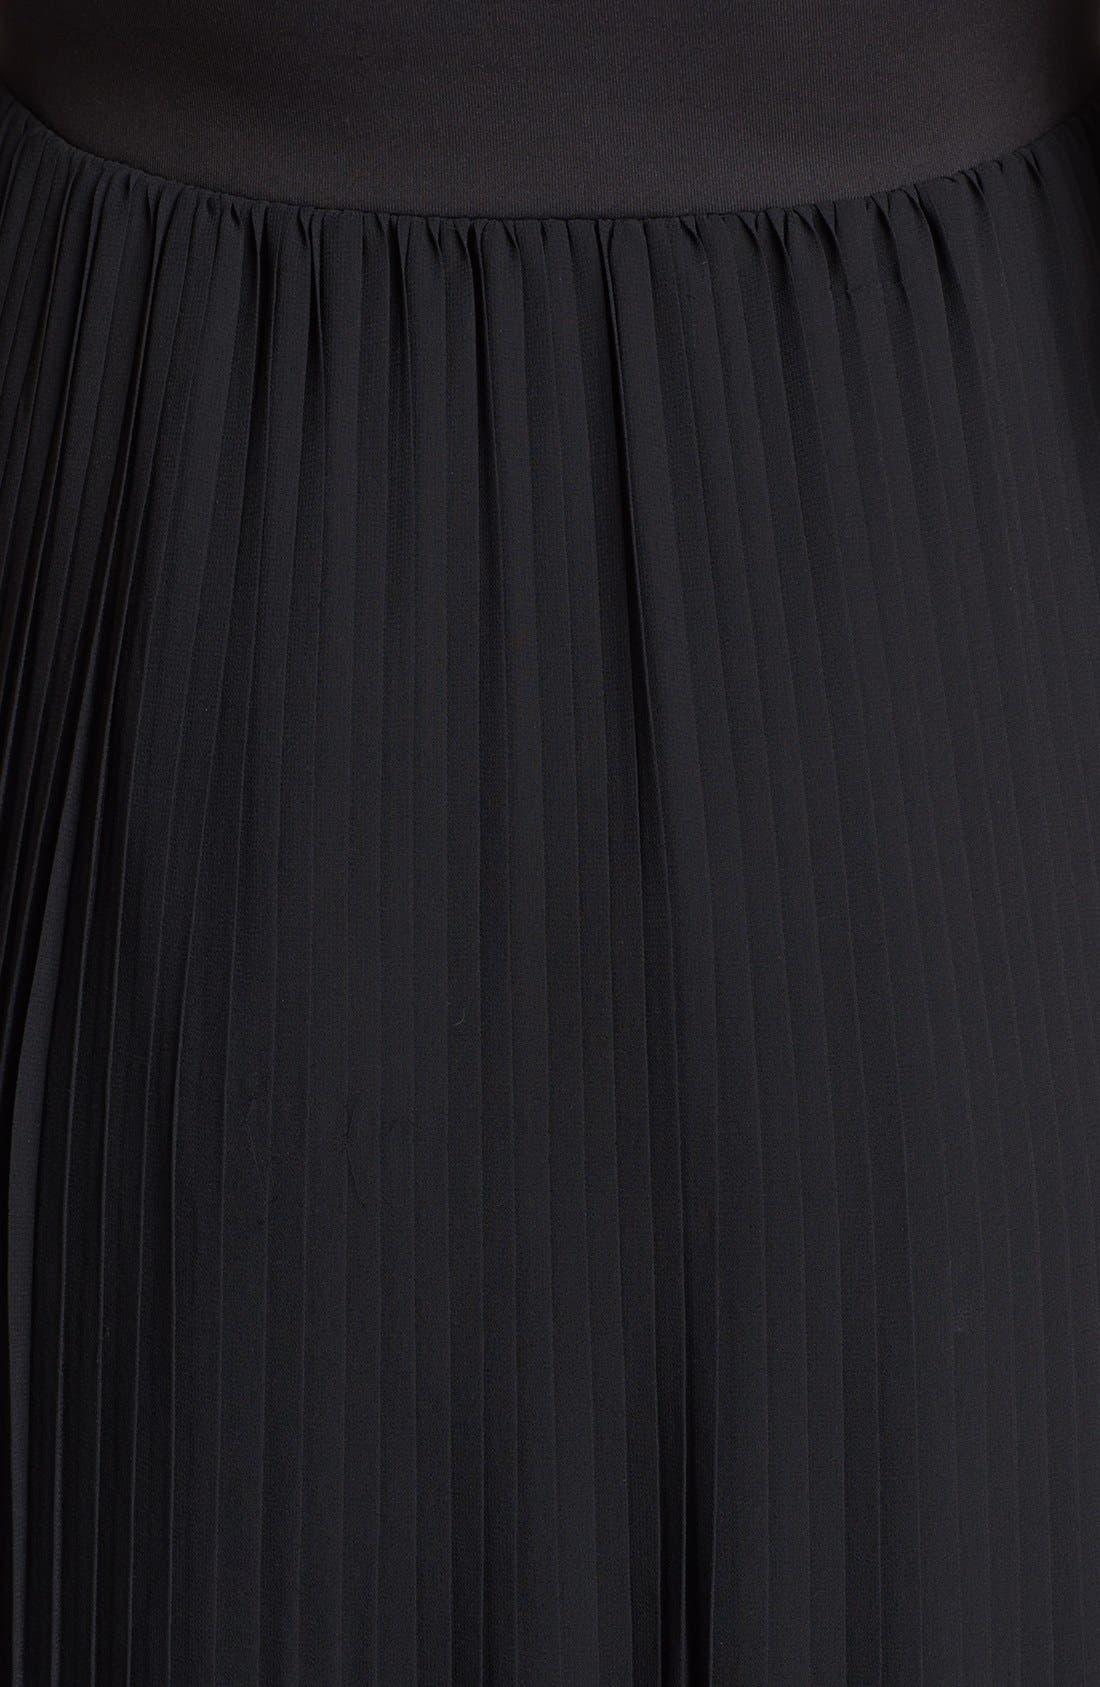 Alternate Image 3  - BLAQUE LABEL Faux Leather & Pleat Chiffon Maxi Dress